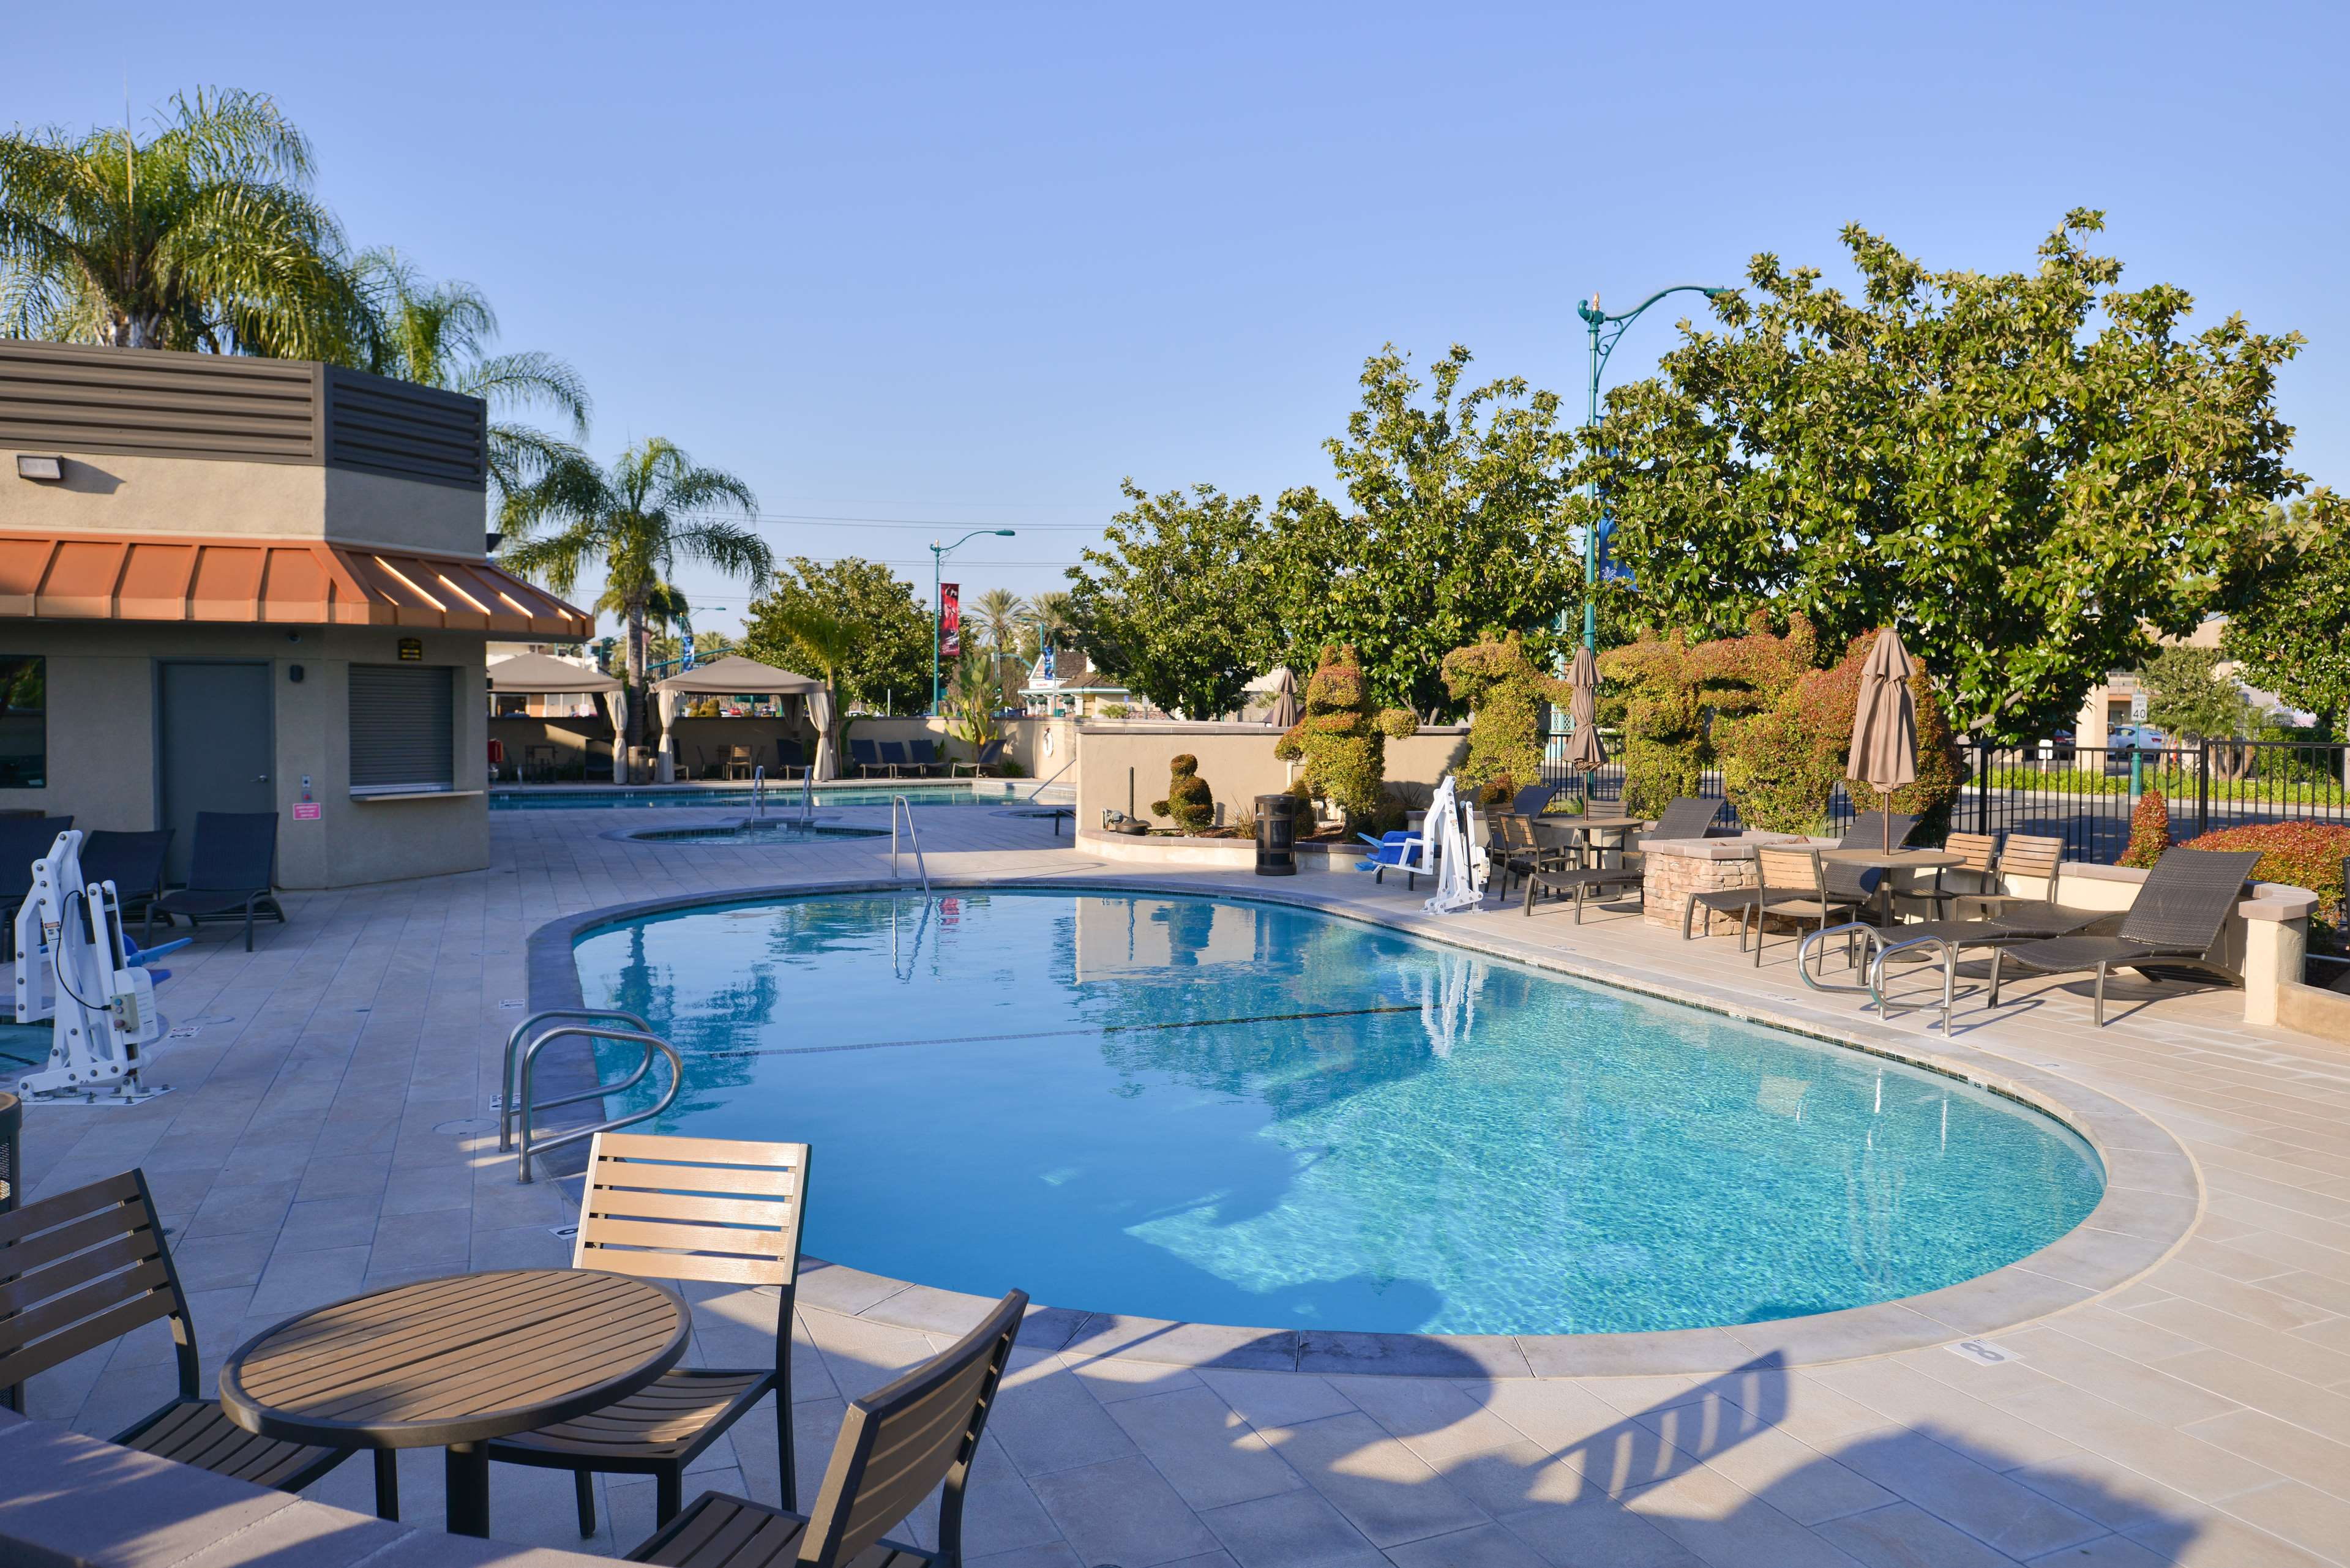 Paradise Ca Hotels Motels